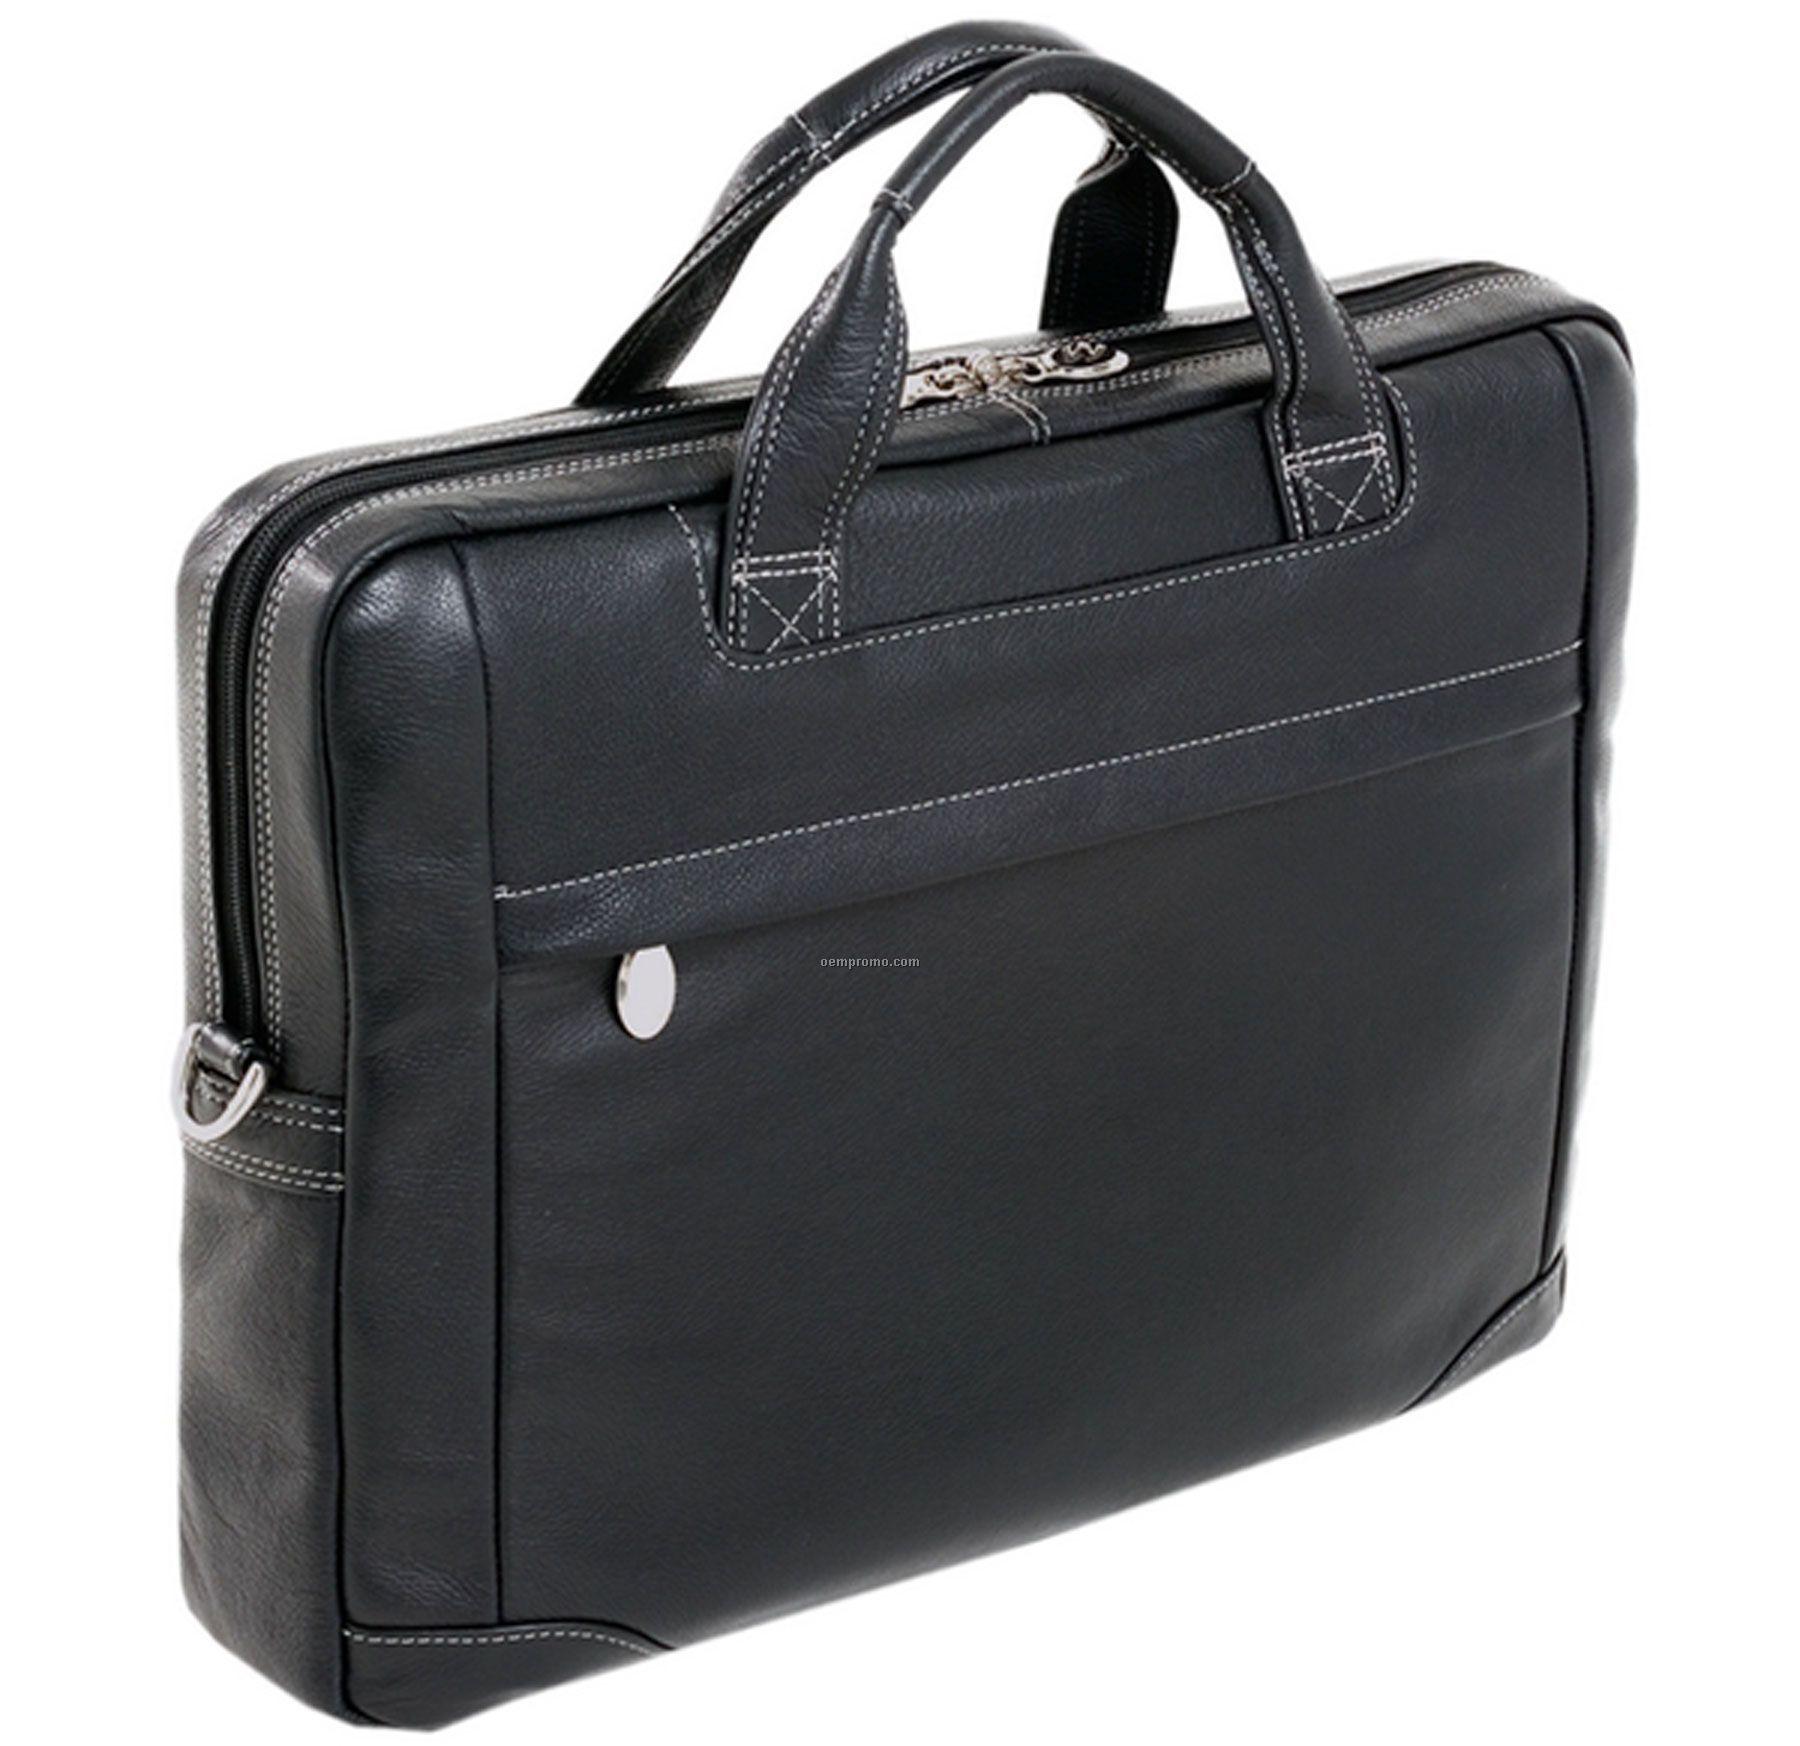 Montclare Leather Netbook Laptop Case - Black